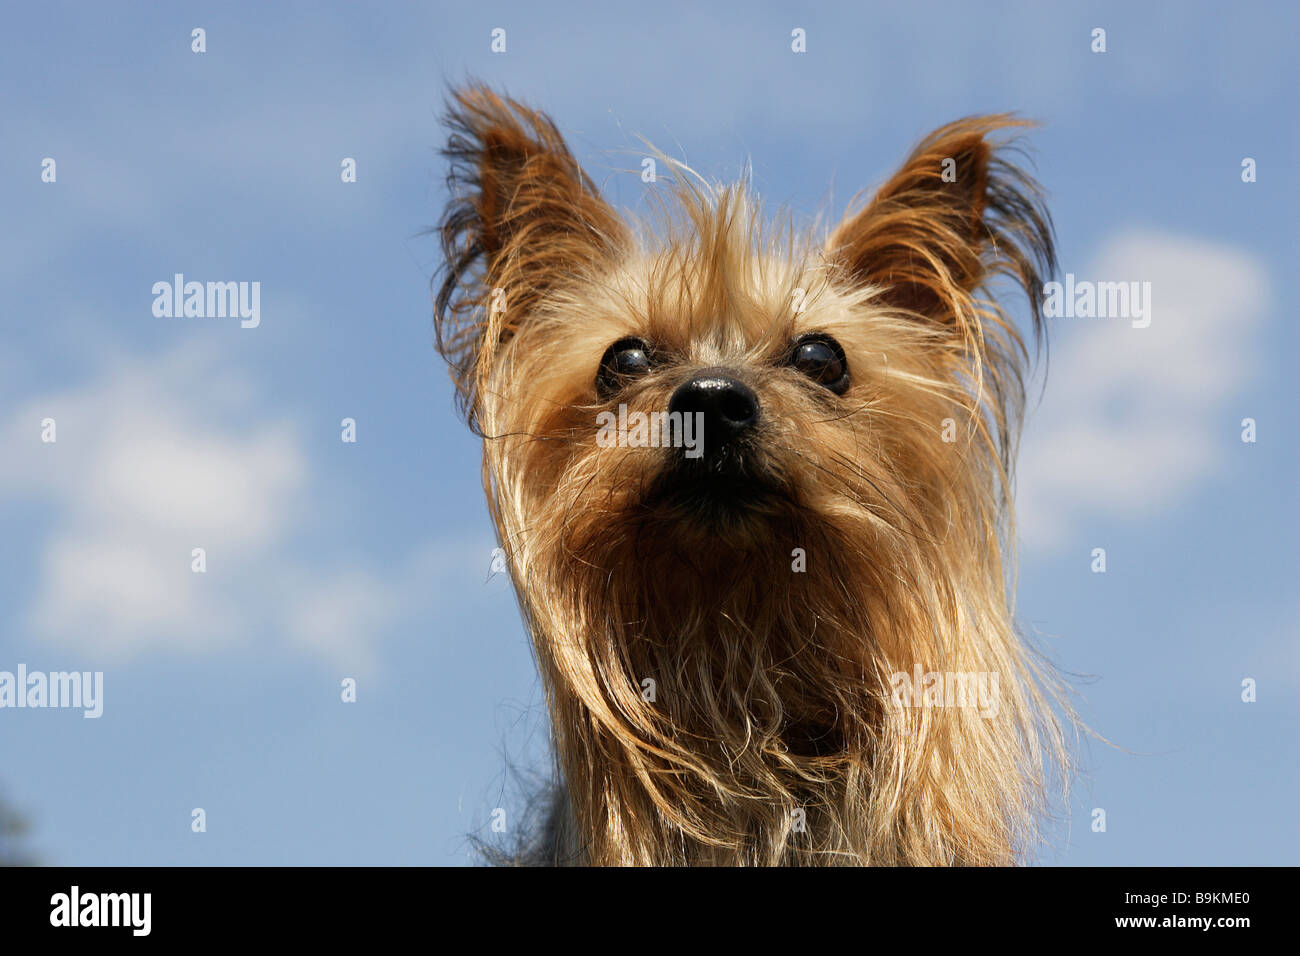 Yorkshire Terrier (Canis lupus familiaris), portrait - Stock Image